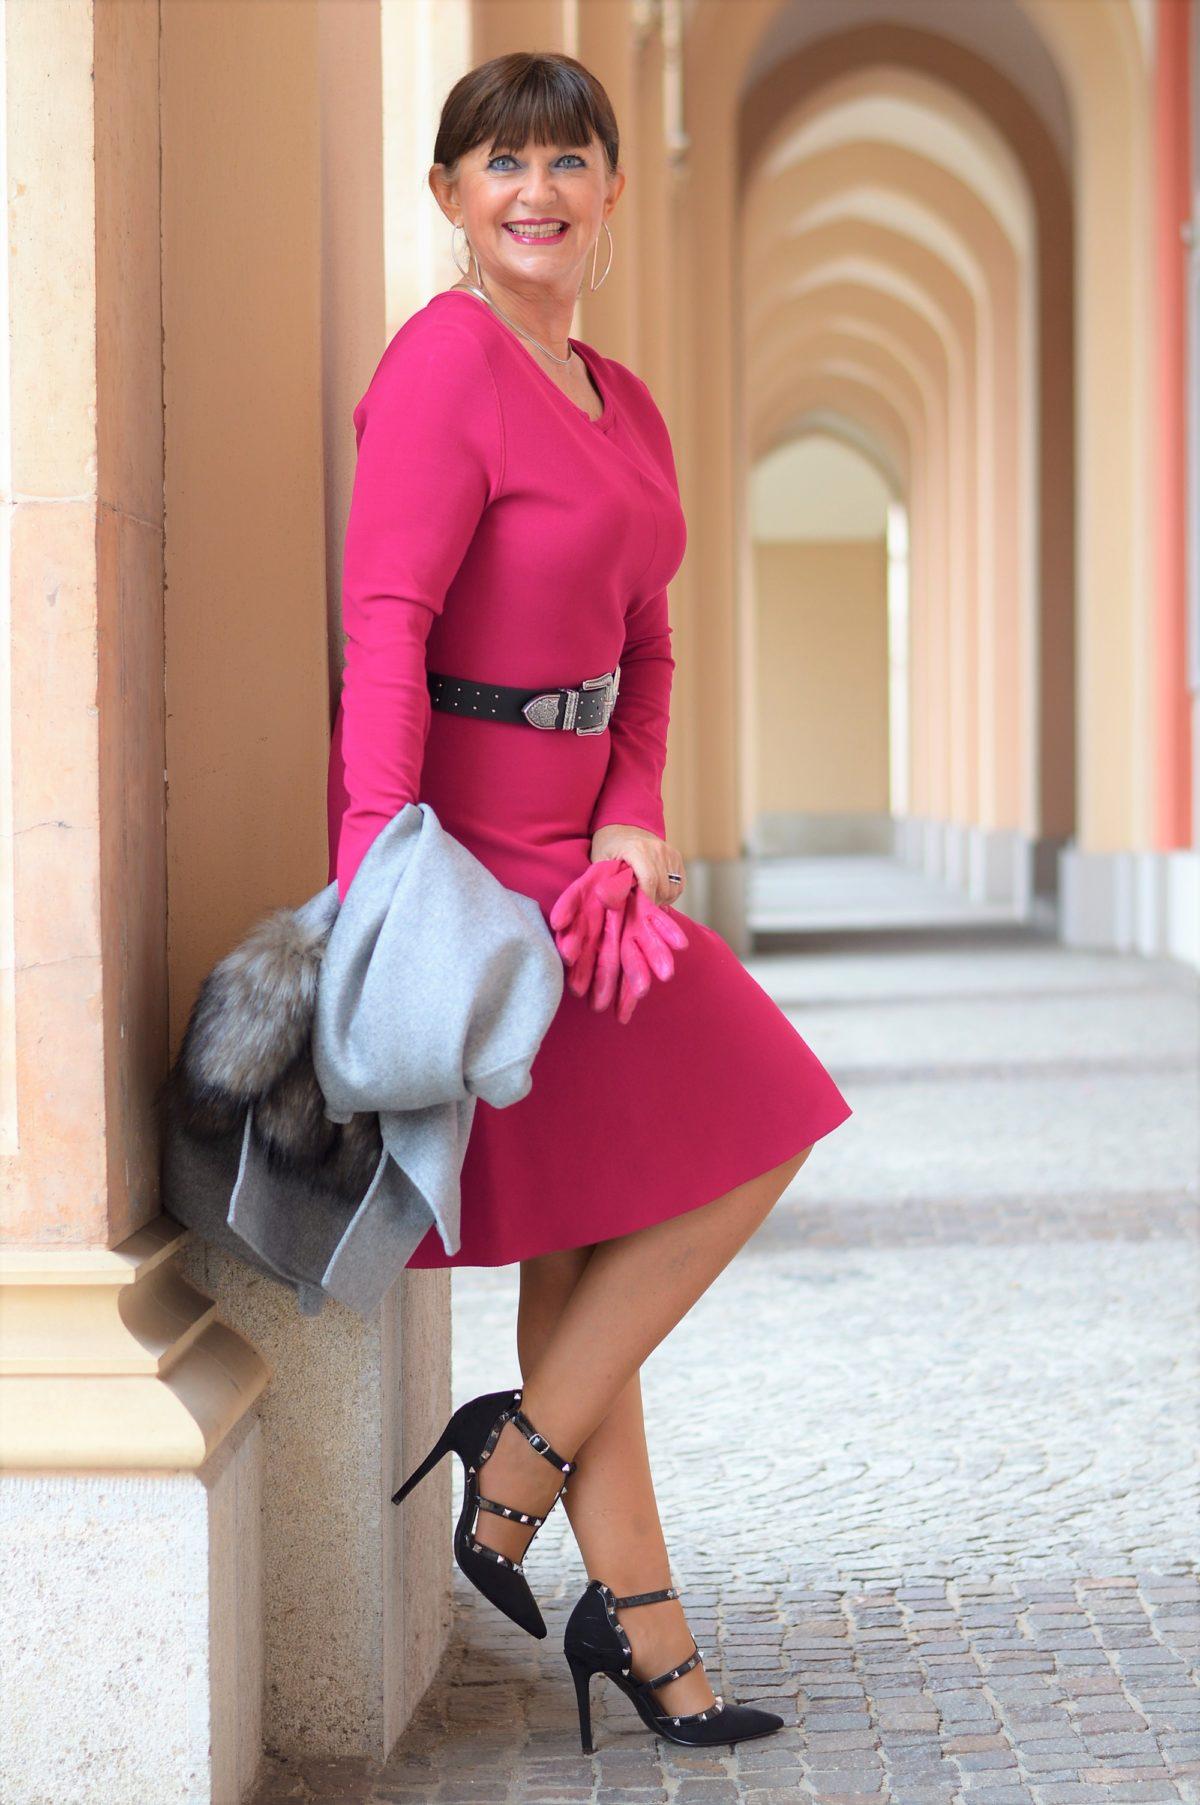 Pinkfarbiges MaxMara Kleid mit Grau